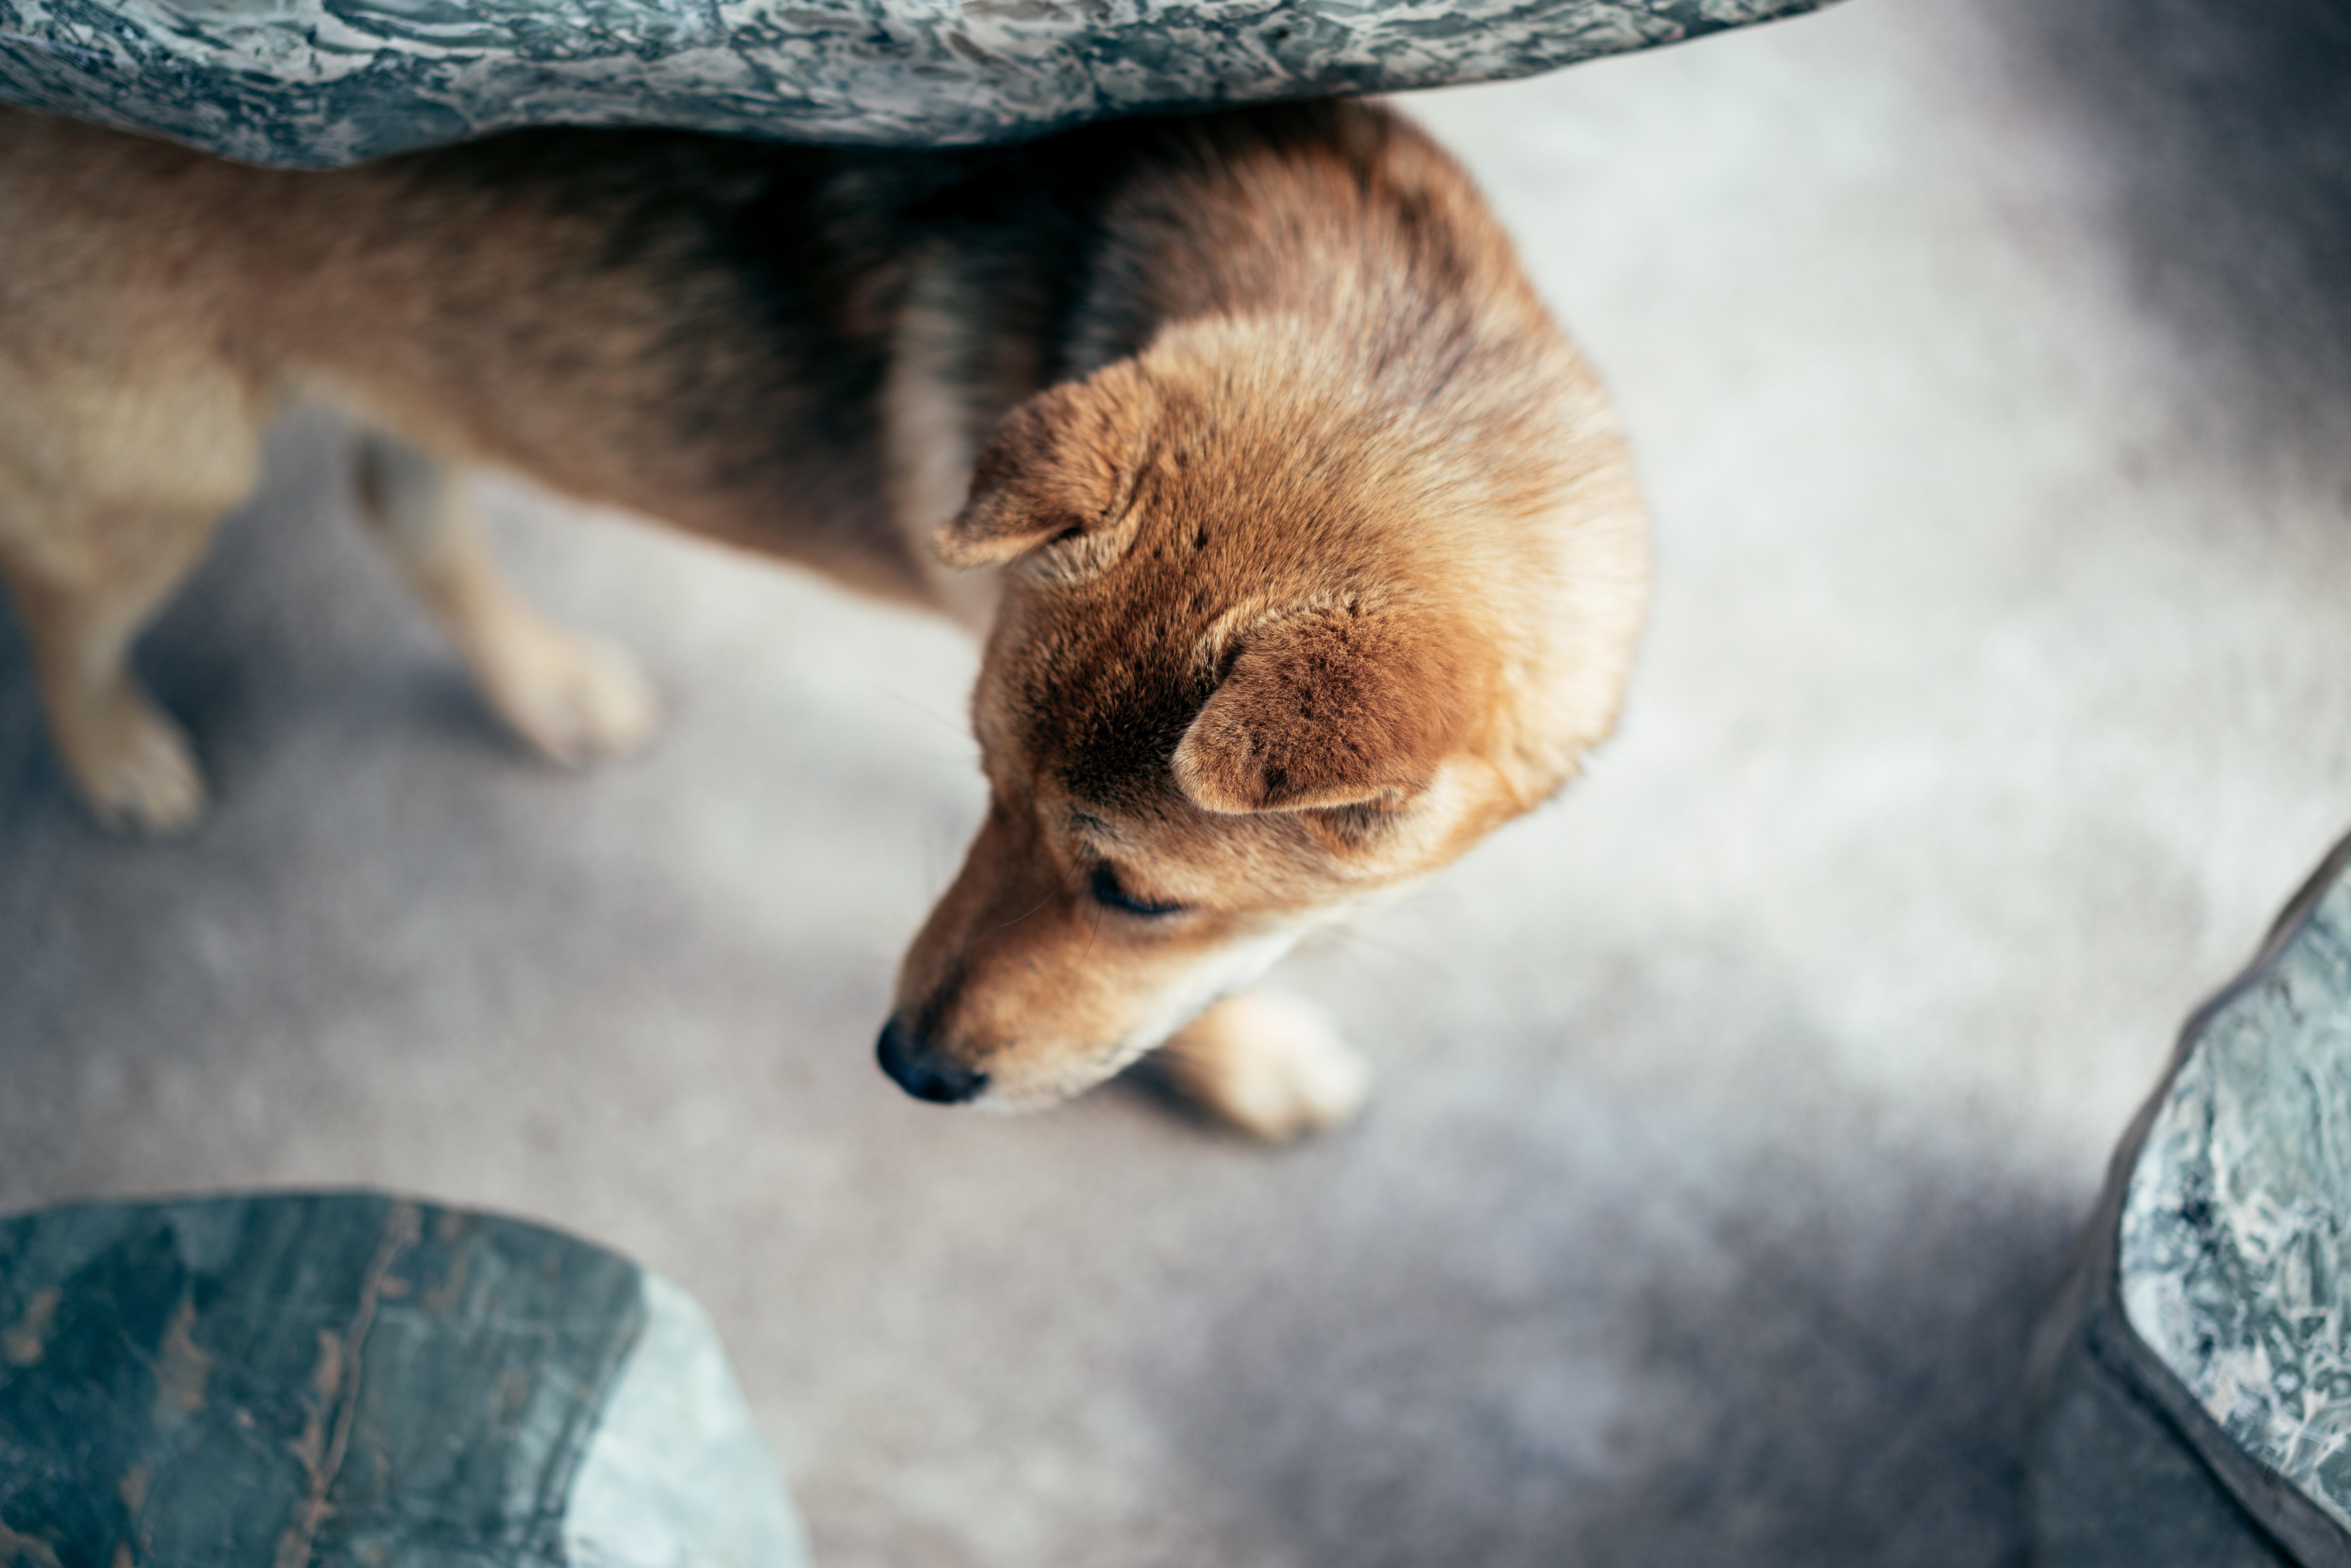 tan puppy on gray concrete flooring